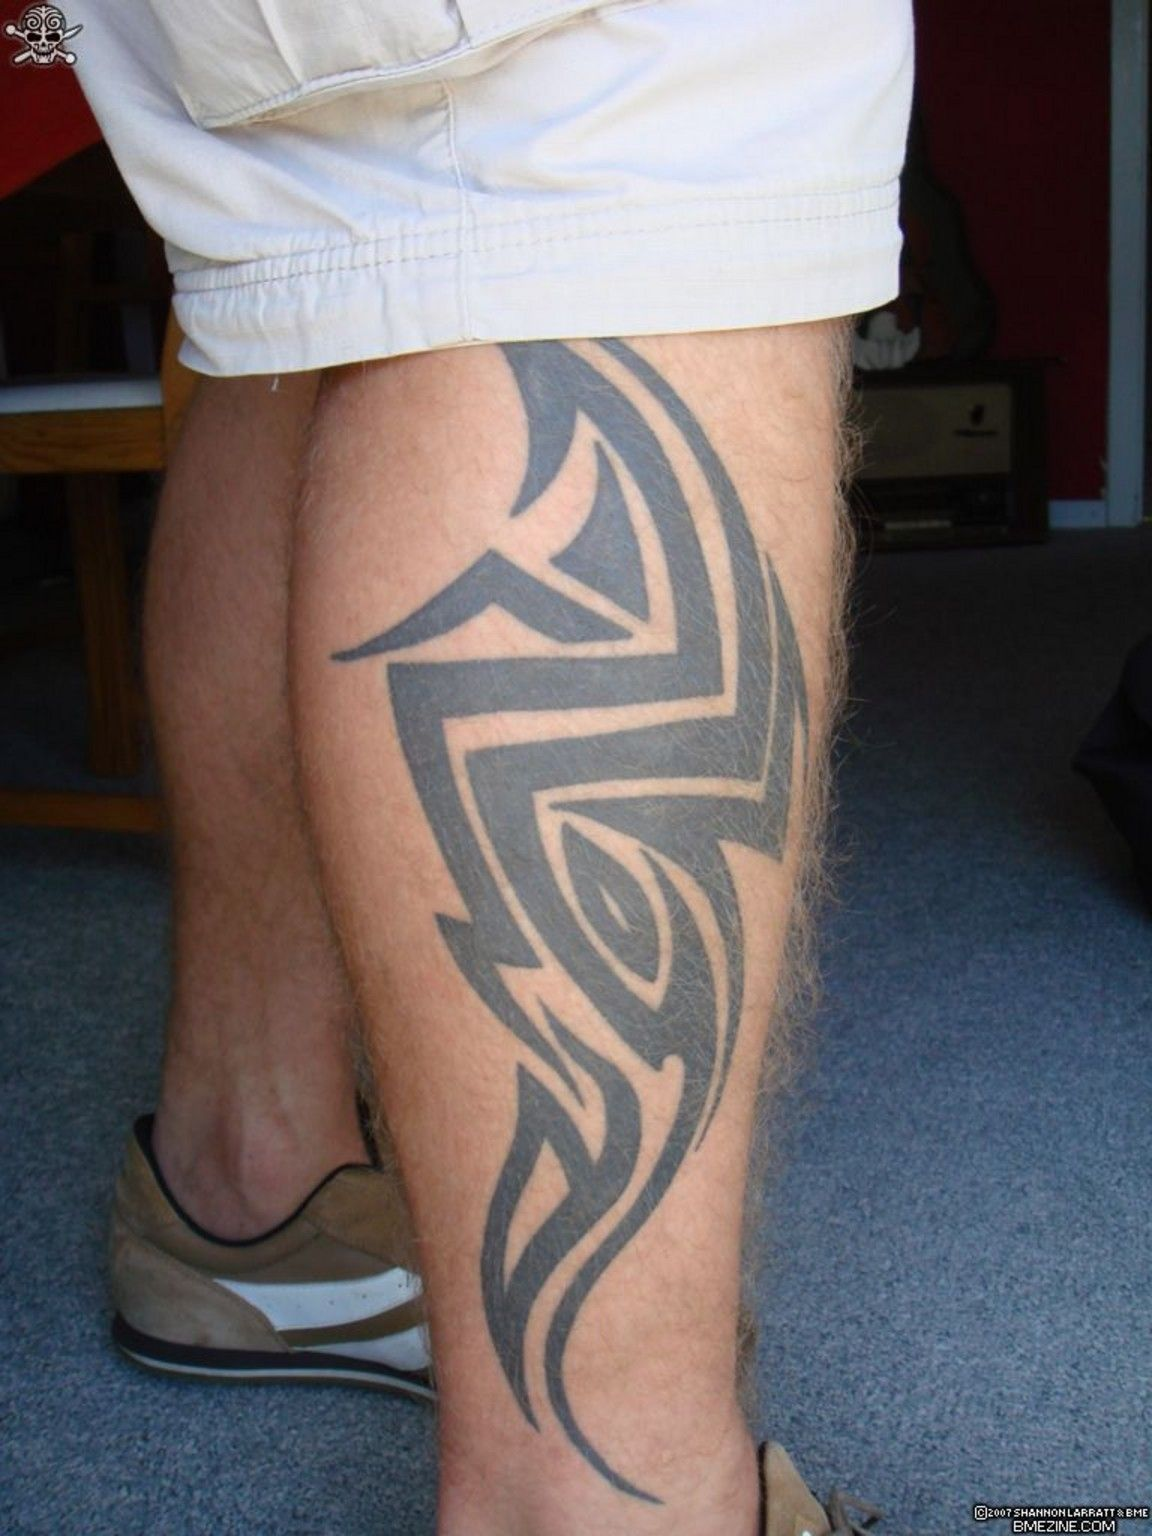 tribal tattoo designs leg for men tattoos pinterest for men tribal tattoos and legs. Black Bedroom Furniture Sets. Home Design Ideas